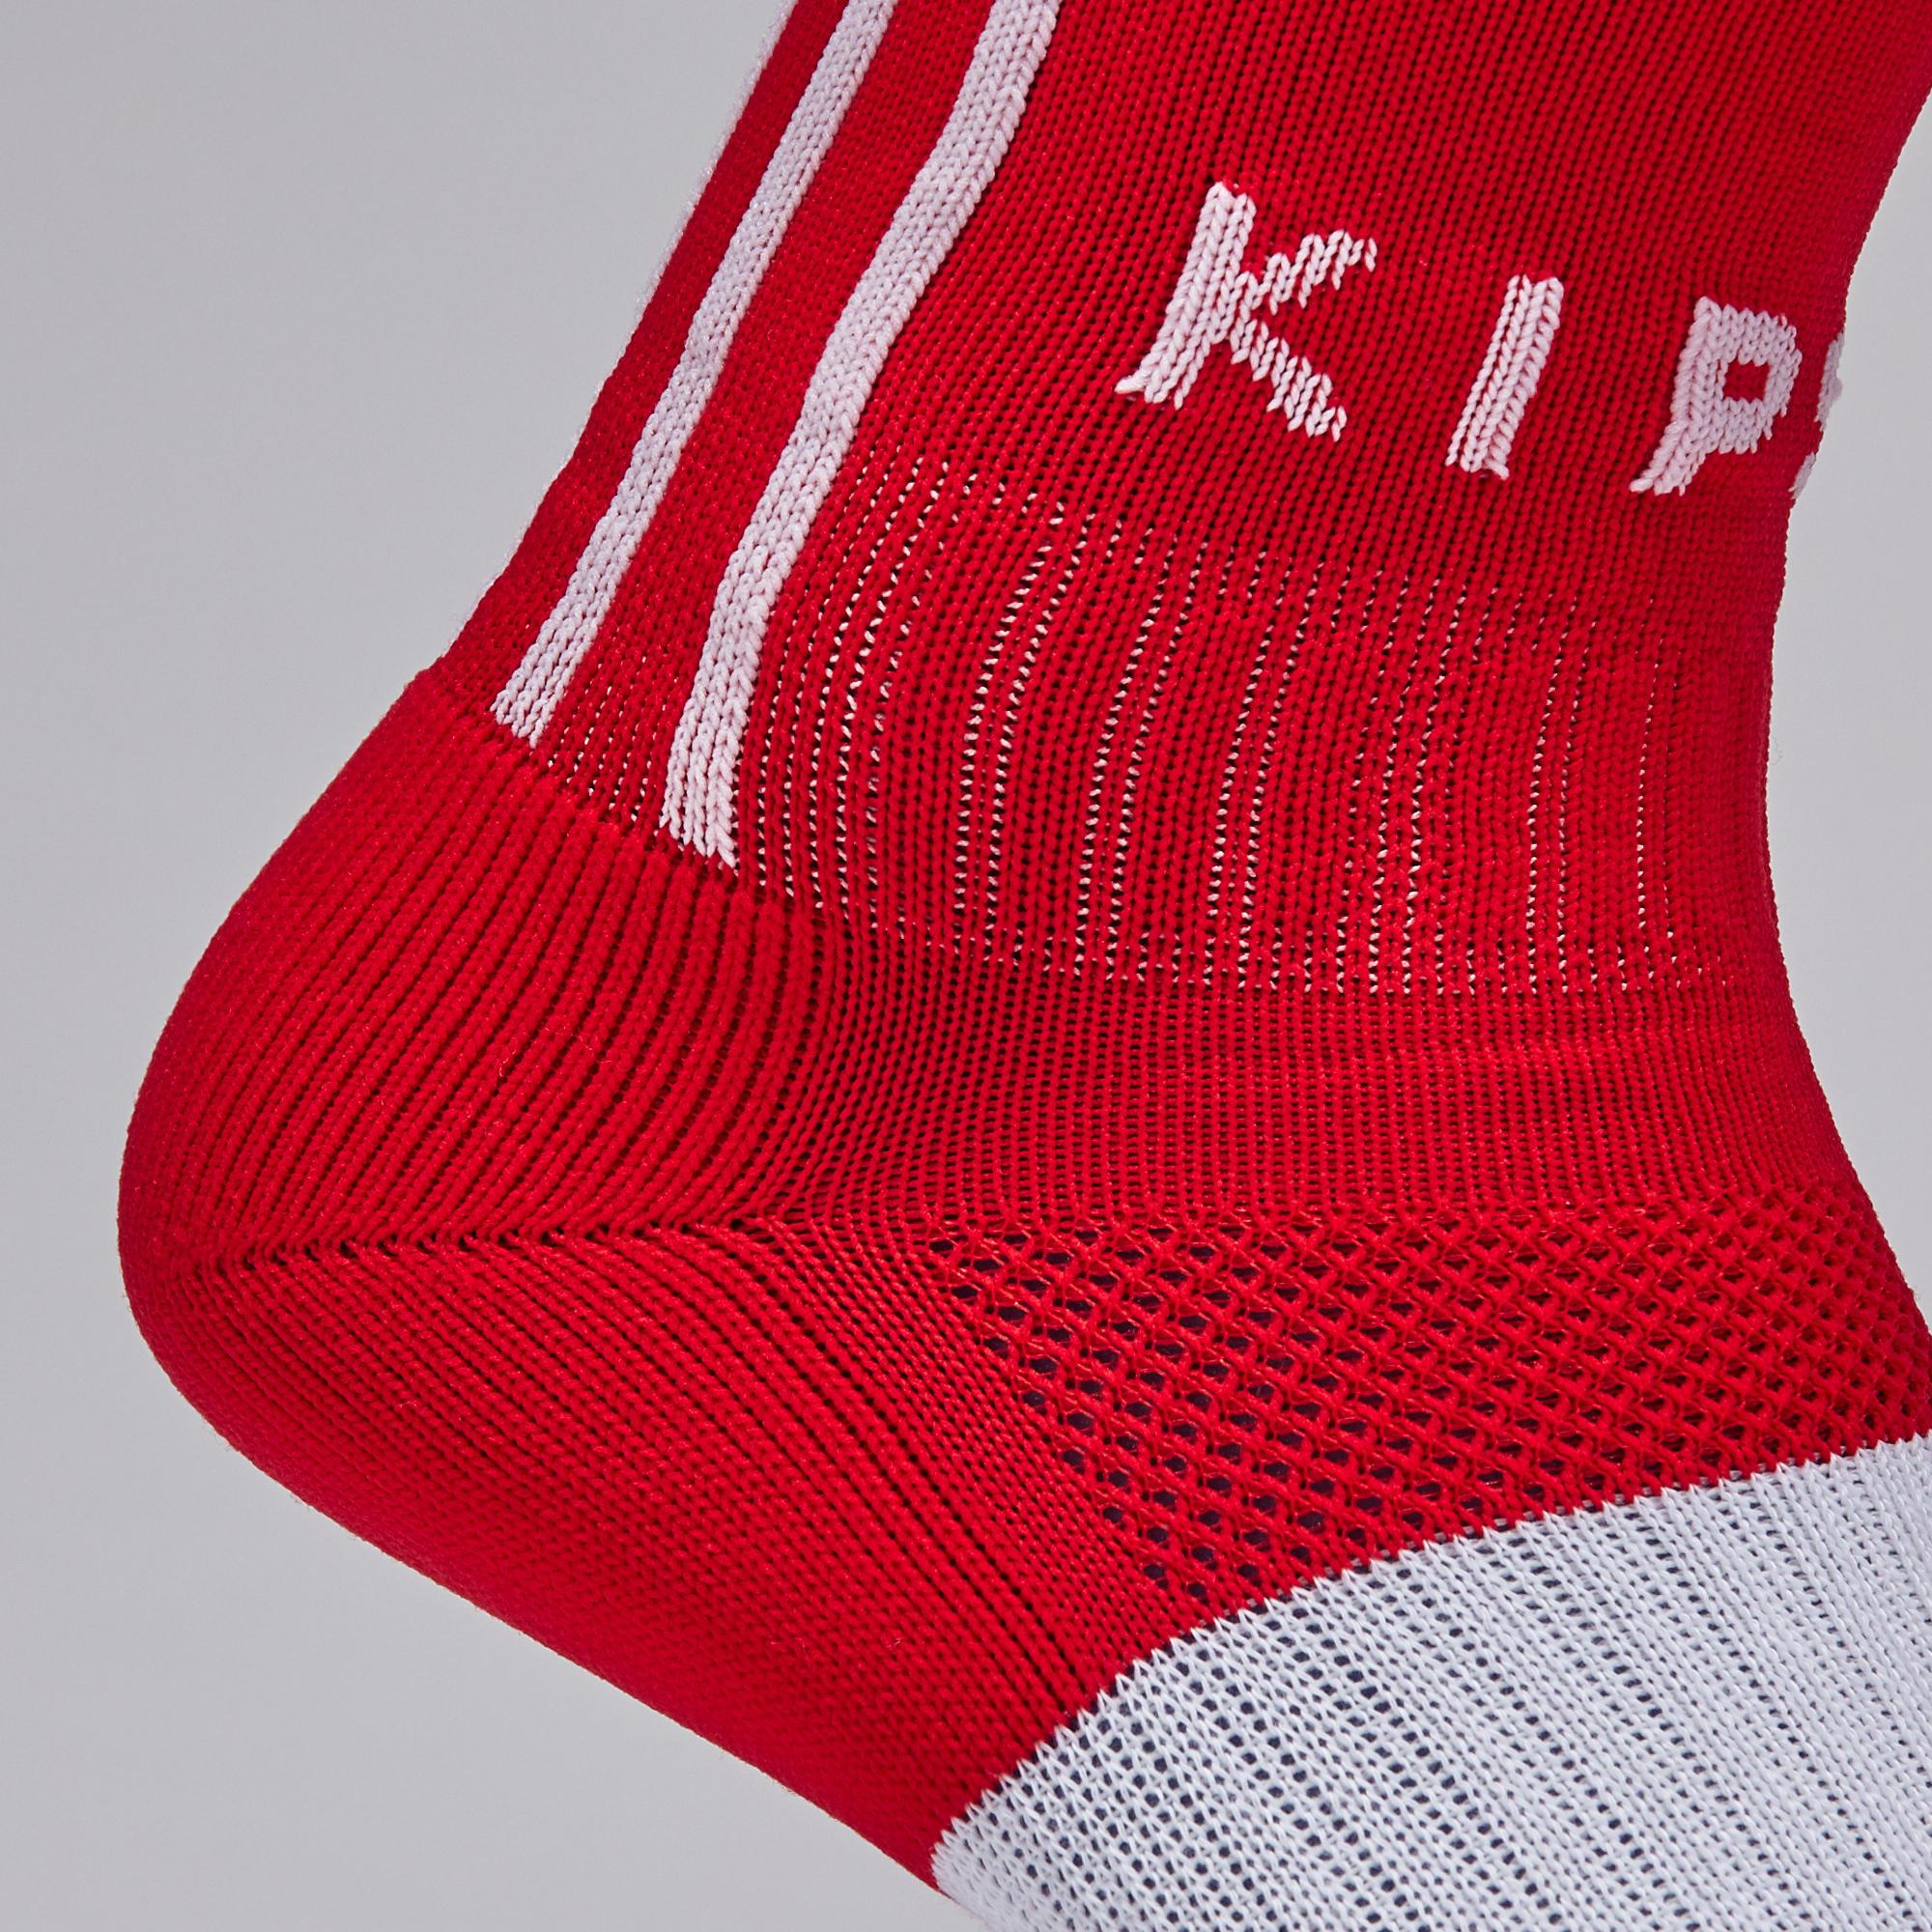 Kipsta F500 Adult Football Socks Red